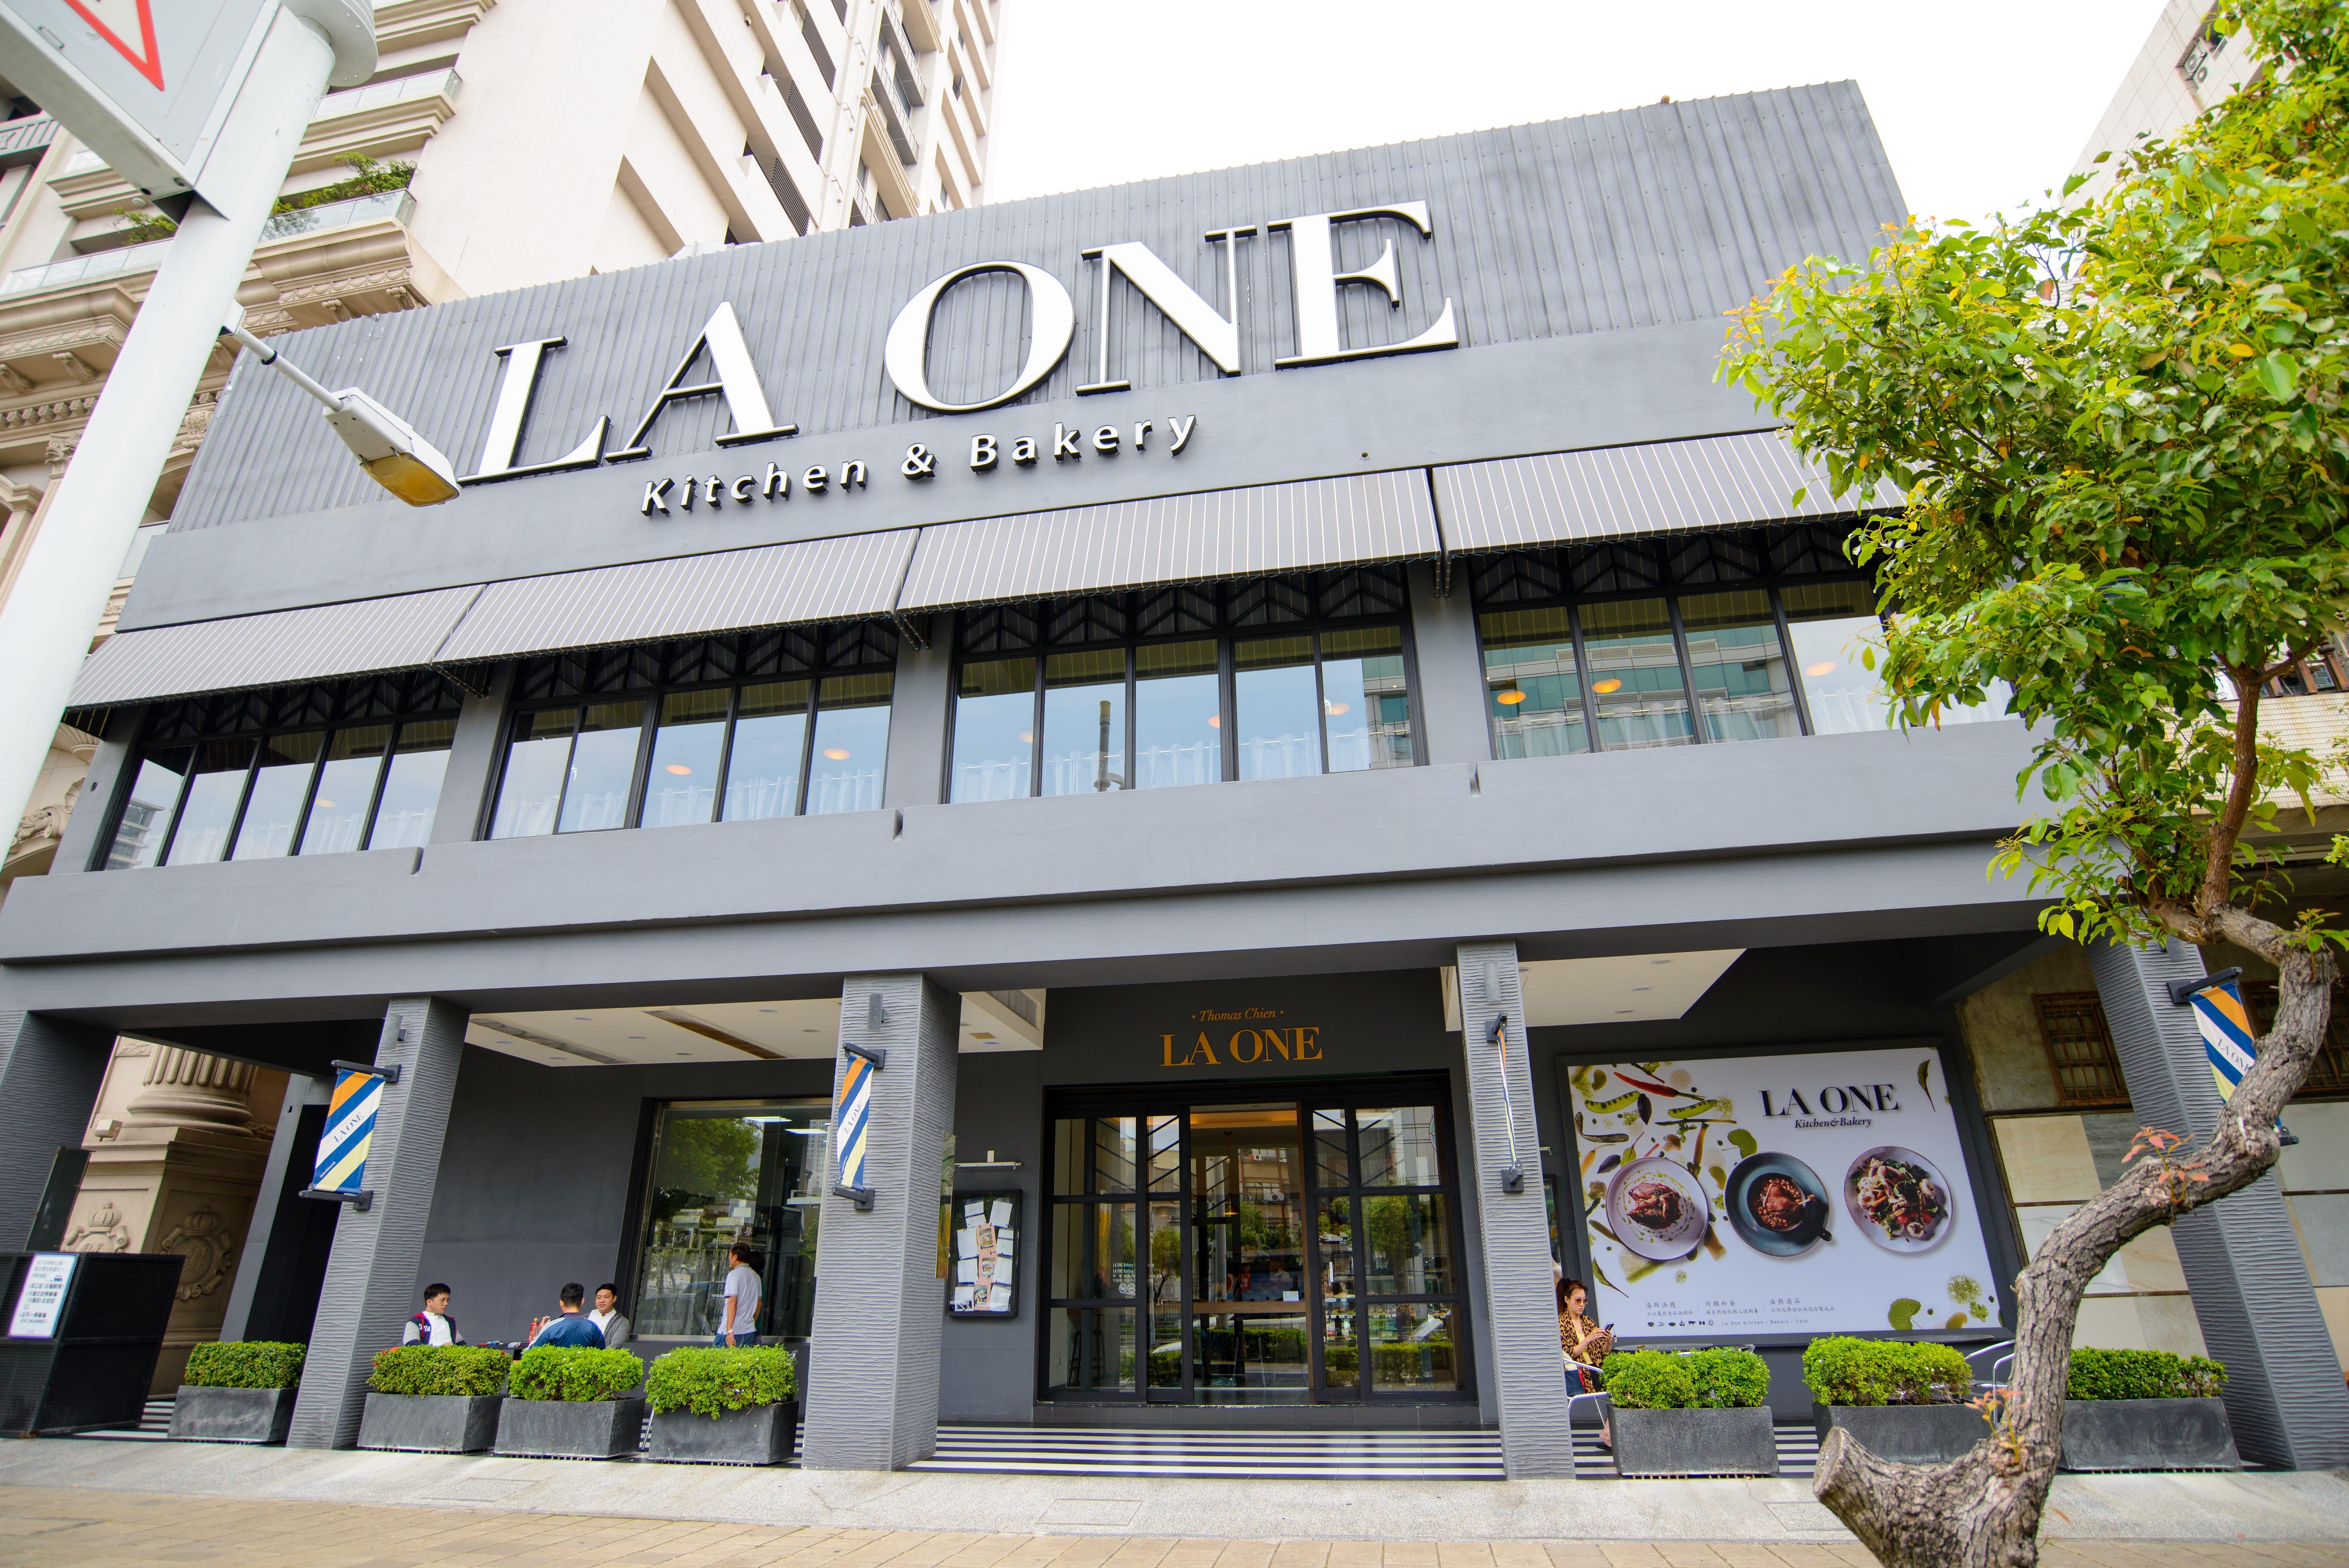 LA ONE Kitchen & Bakery